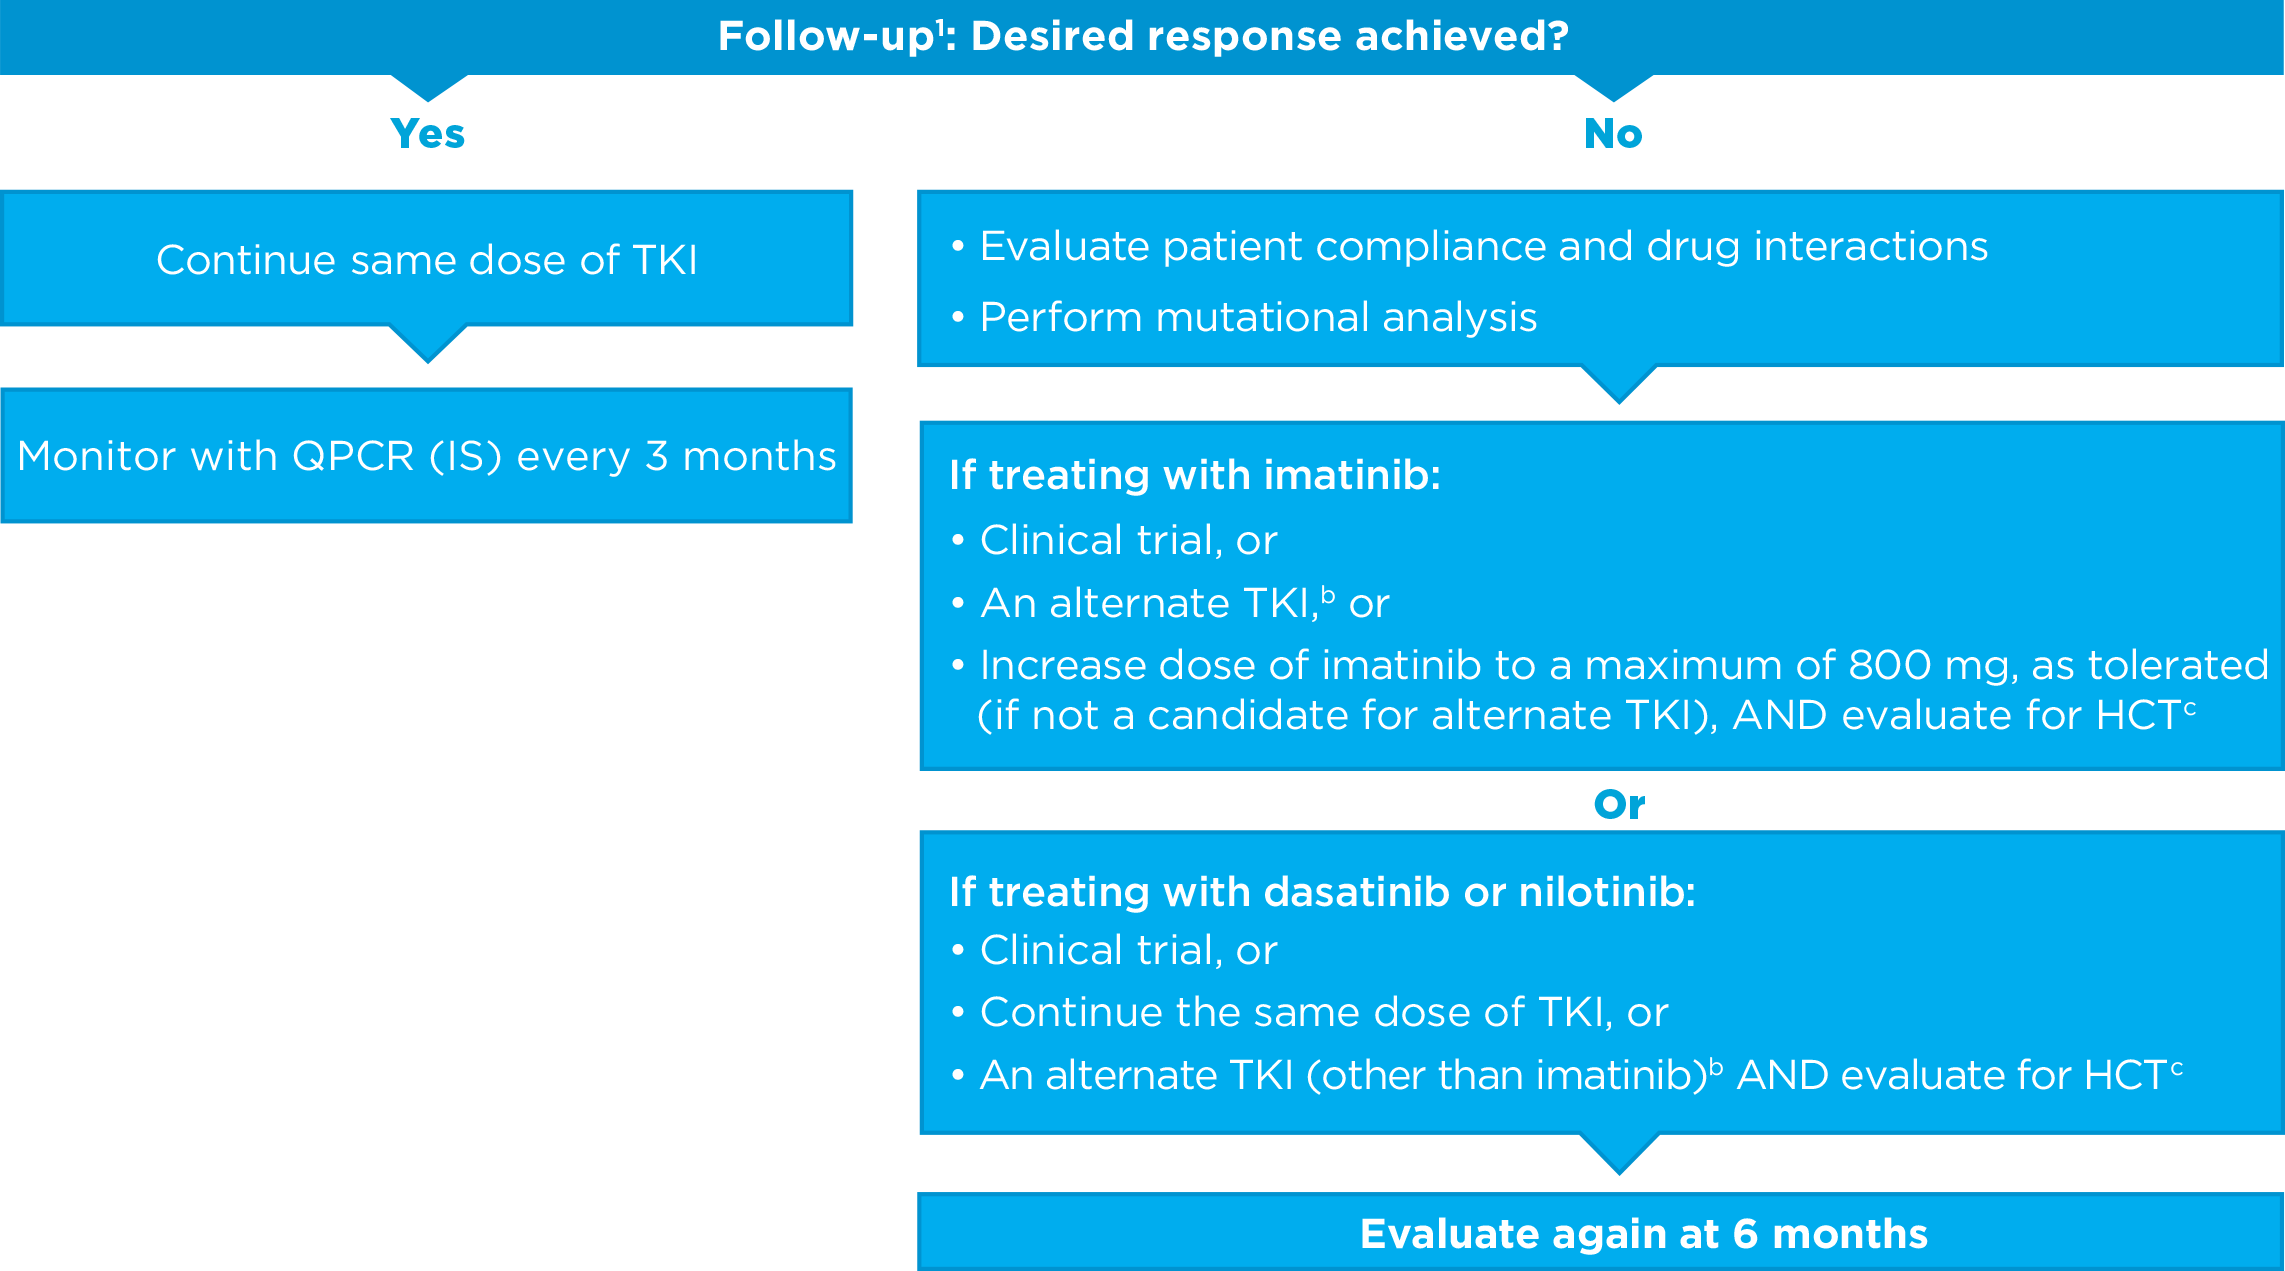 Guidelines | BOSULIF® (bosutinib) Tablets | Safety Info